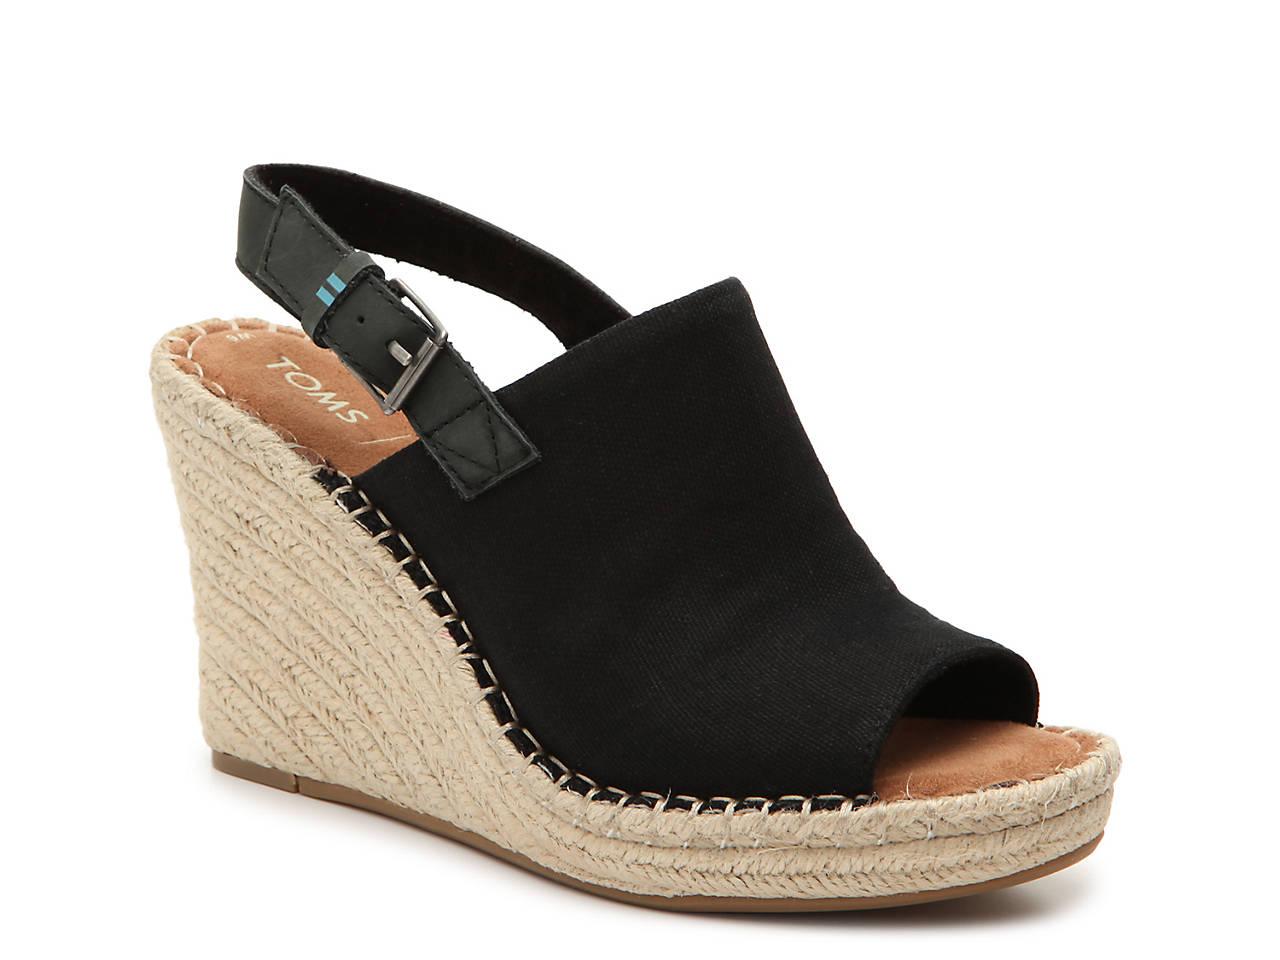 fe8901836ae TOMS Monica Espadrille Wedge Sandal Women s Shoes